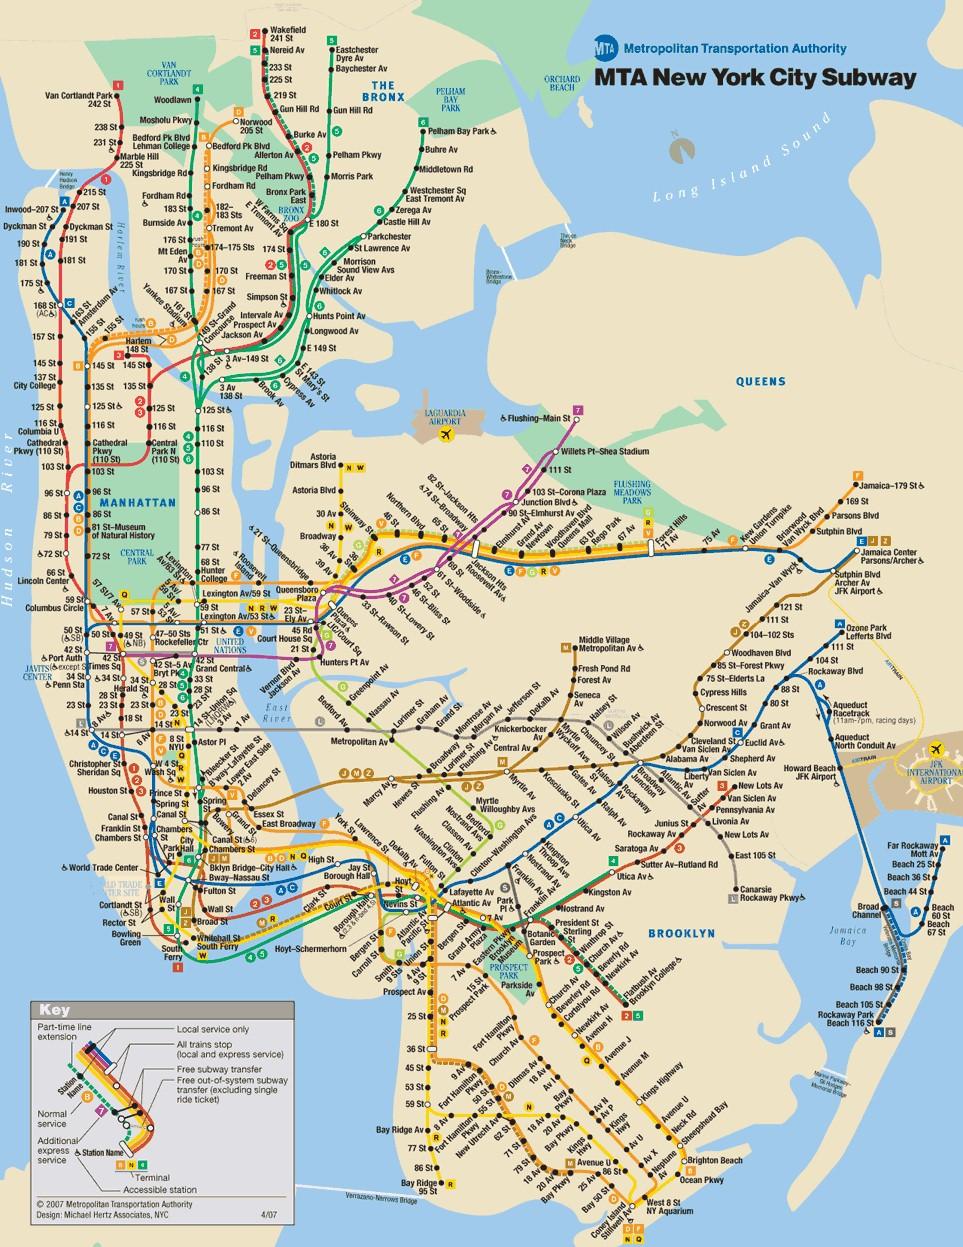 New York City Subway Map 1979.World S Most Intricate Subway Networks Geoengineer Org